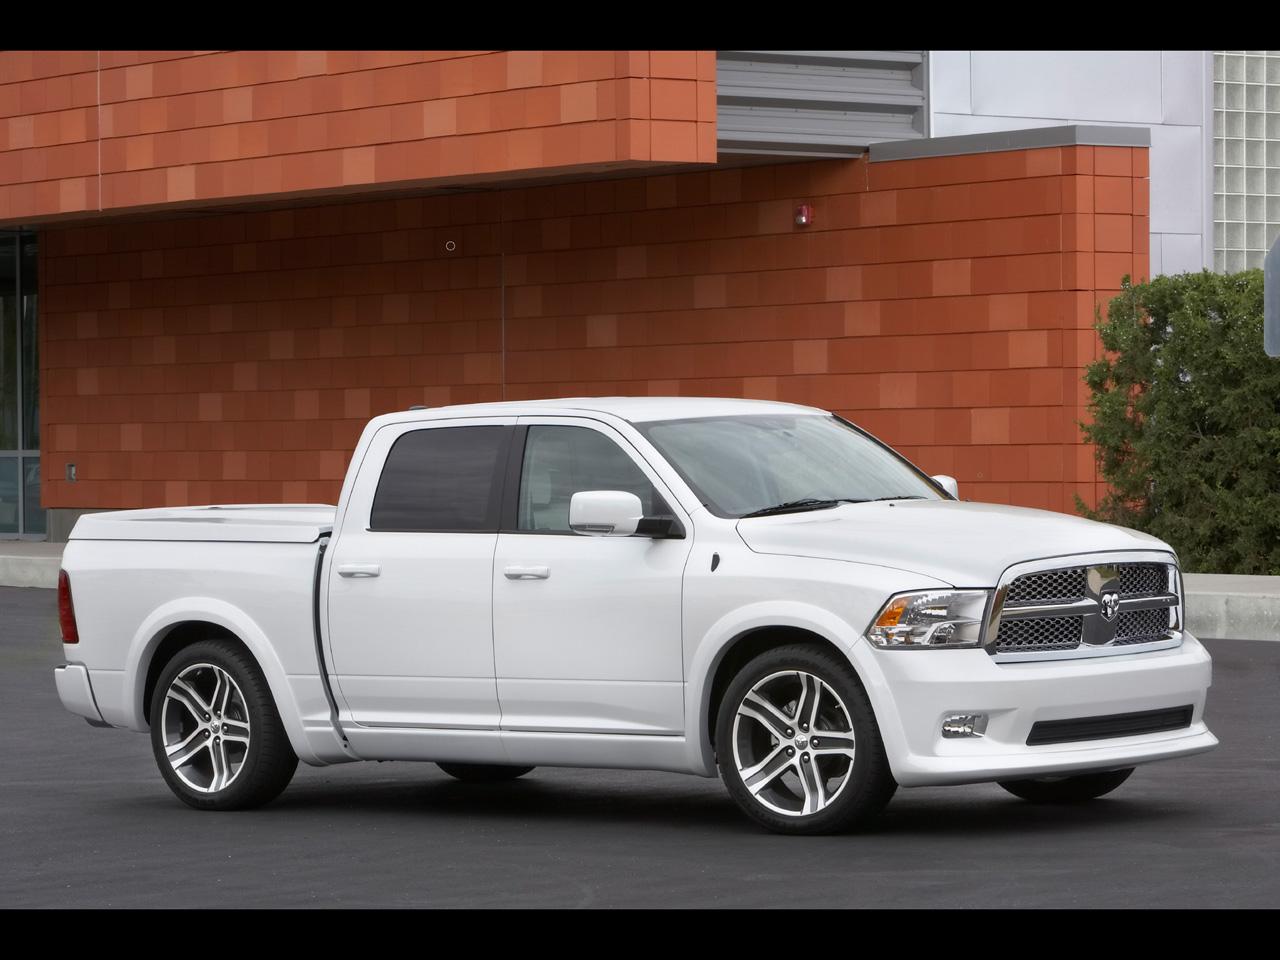 Carl Burger Dodge Used Cars >> 2009 Dodge Ram Bianco | Autos Post